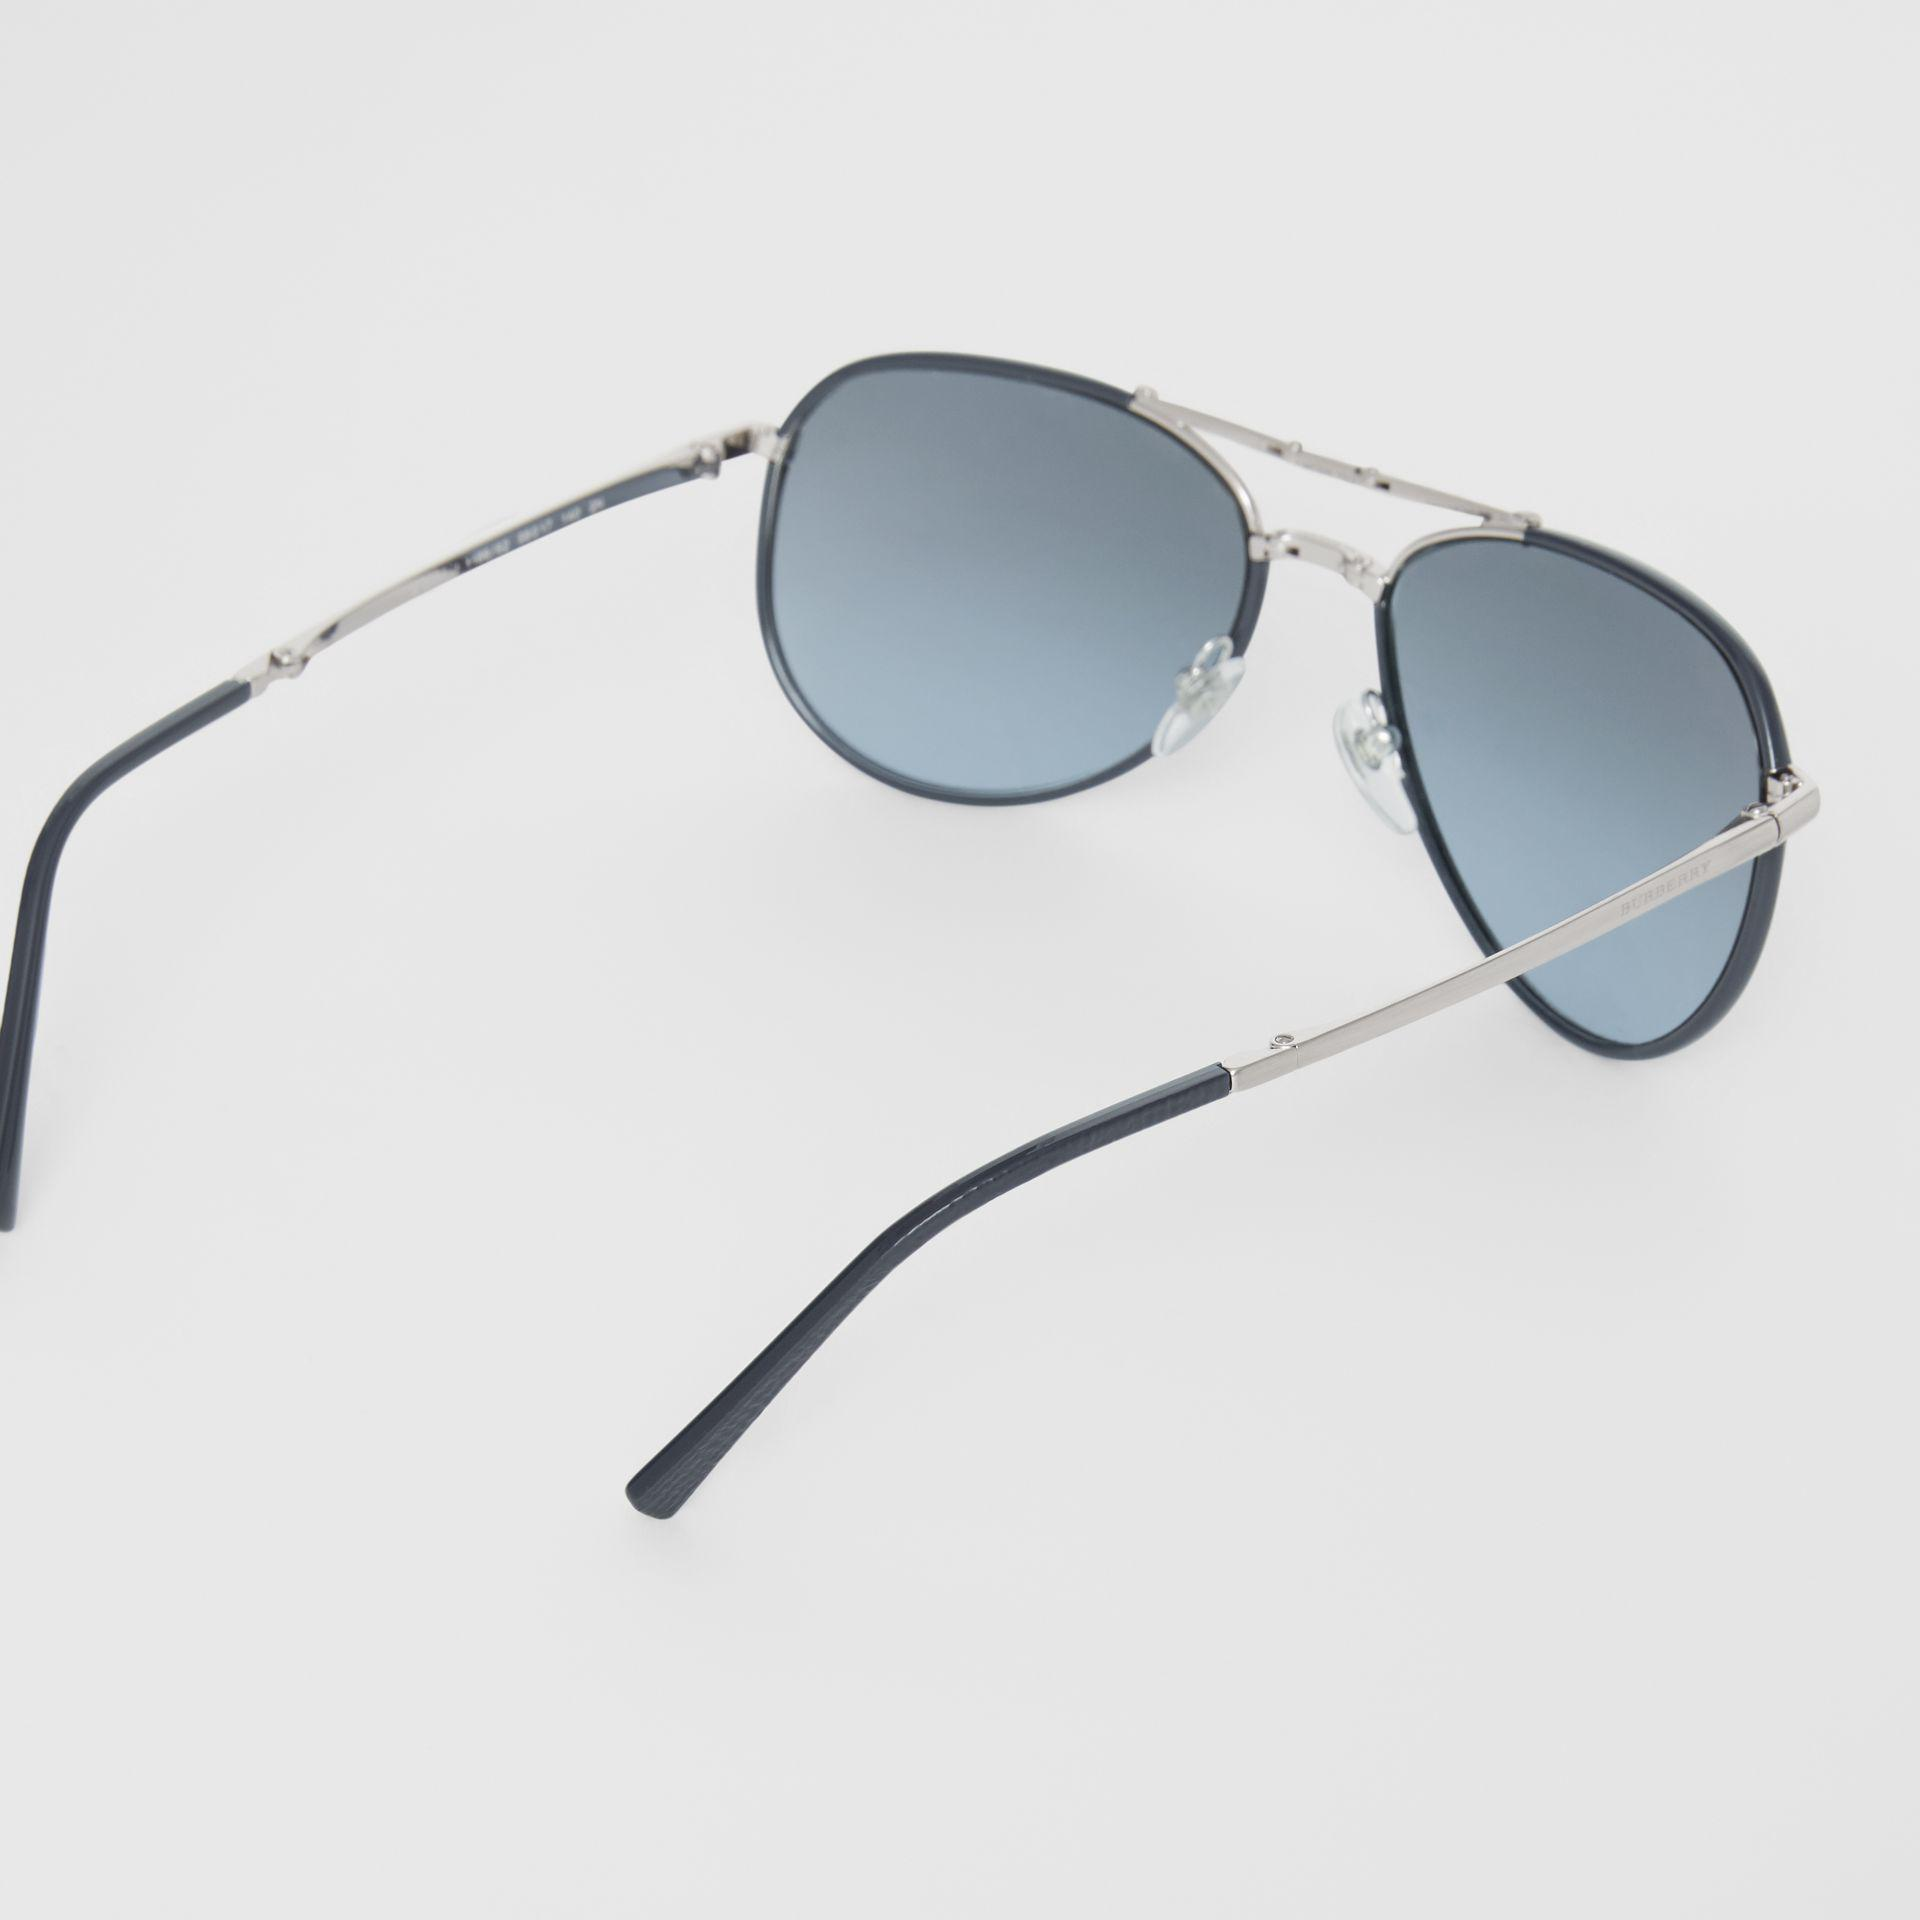 6a127039445 Burberry - Blue Folding Pilot Sunglasses for Men - Lyst. View fullscreen